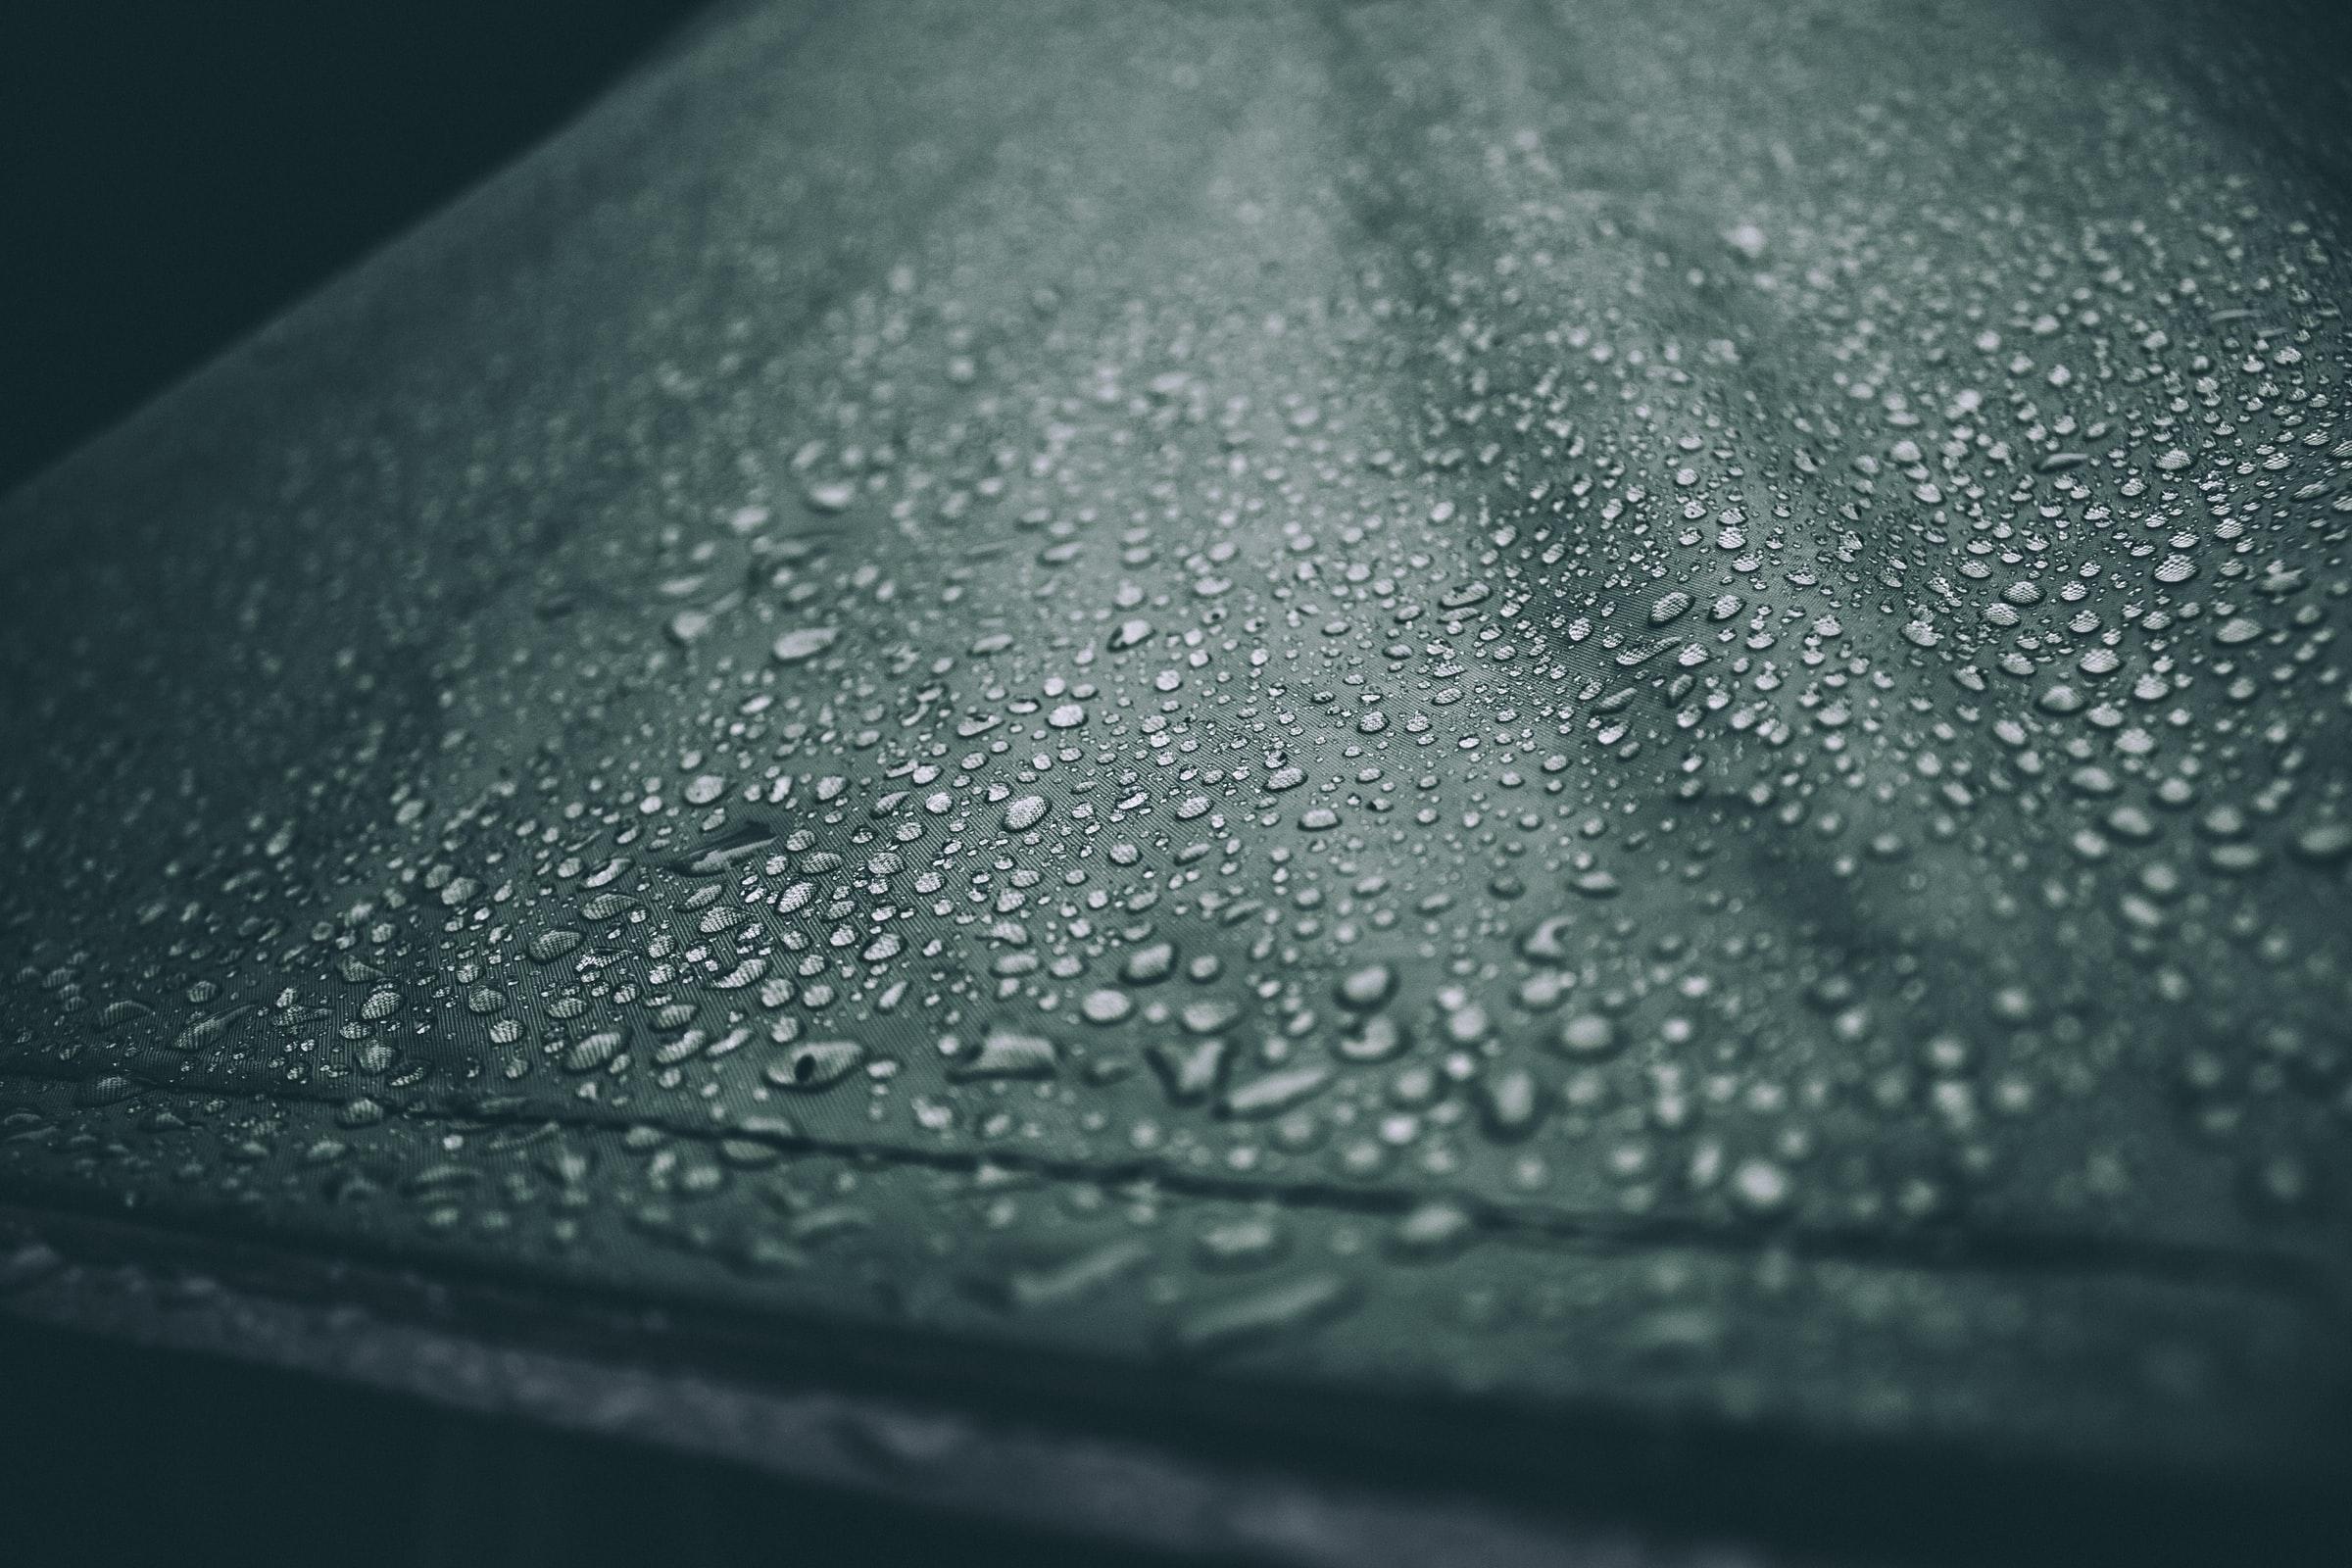 rando inside, randonnée léger, sac léger, condensation